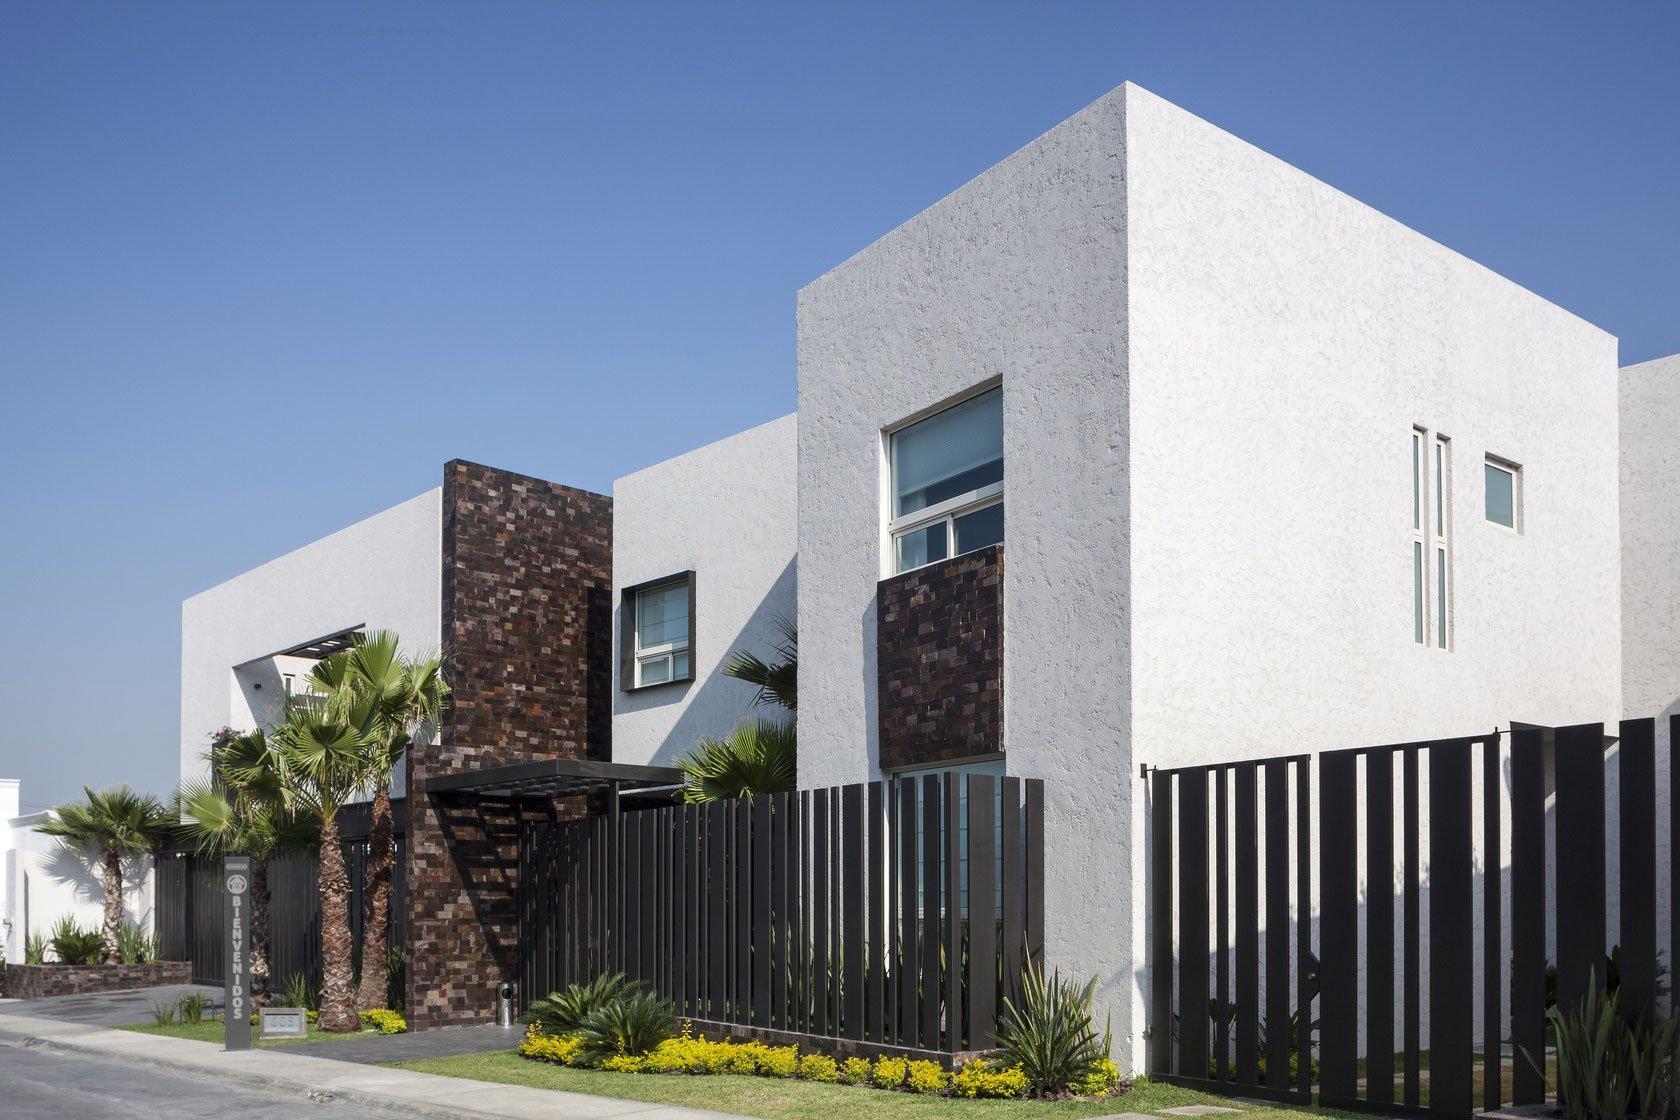 Casa Sorteo Tec No. 191 by Arq. Bernardo Hinojosa